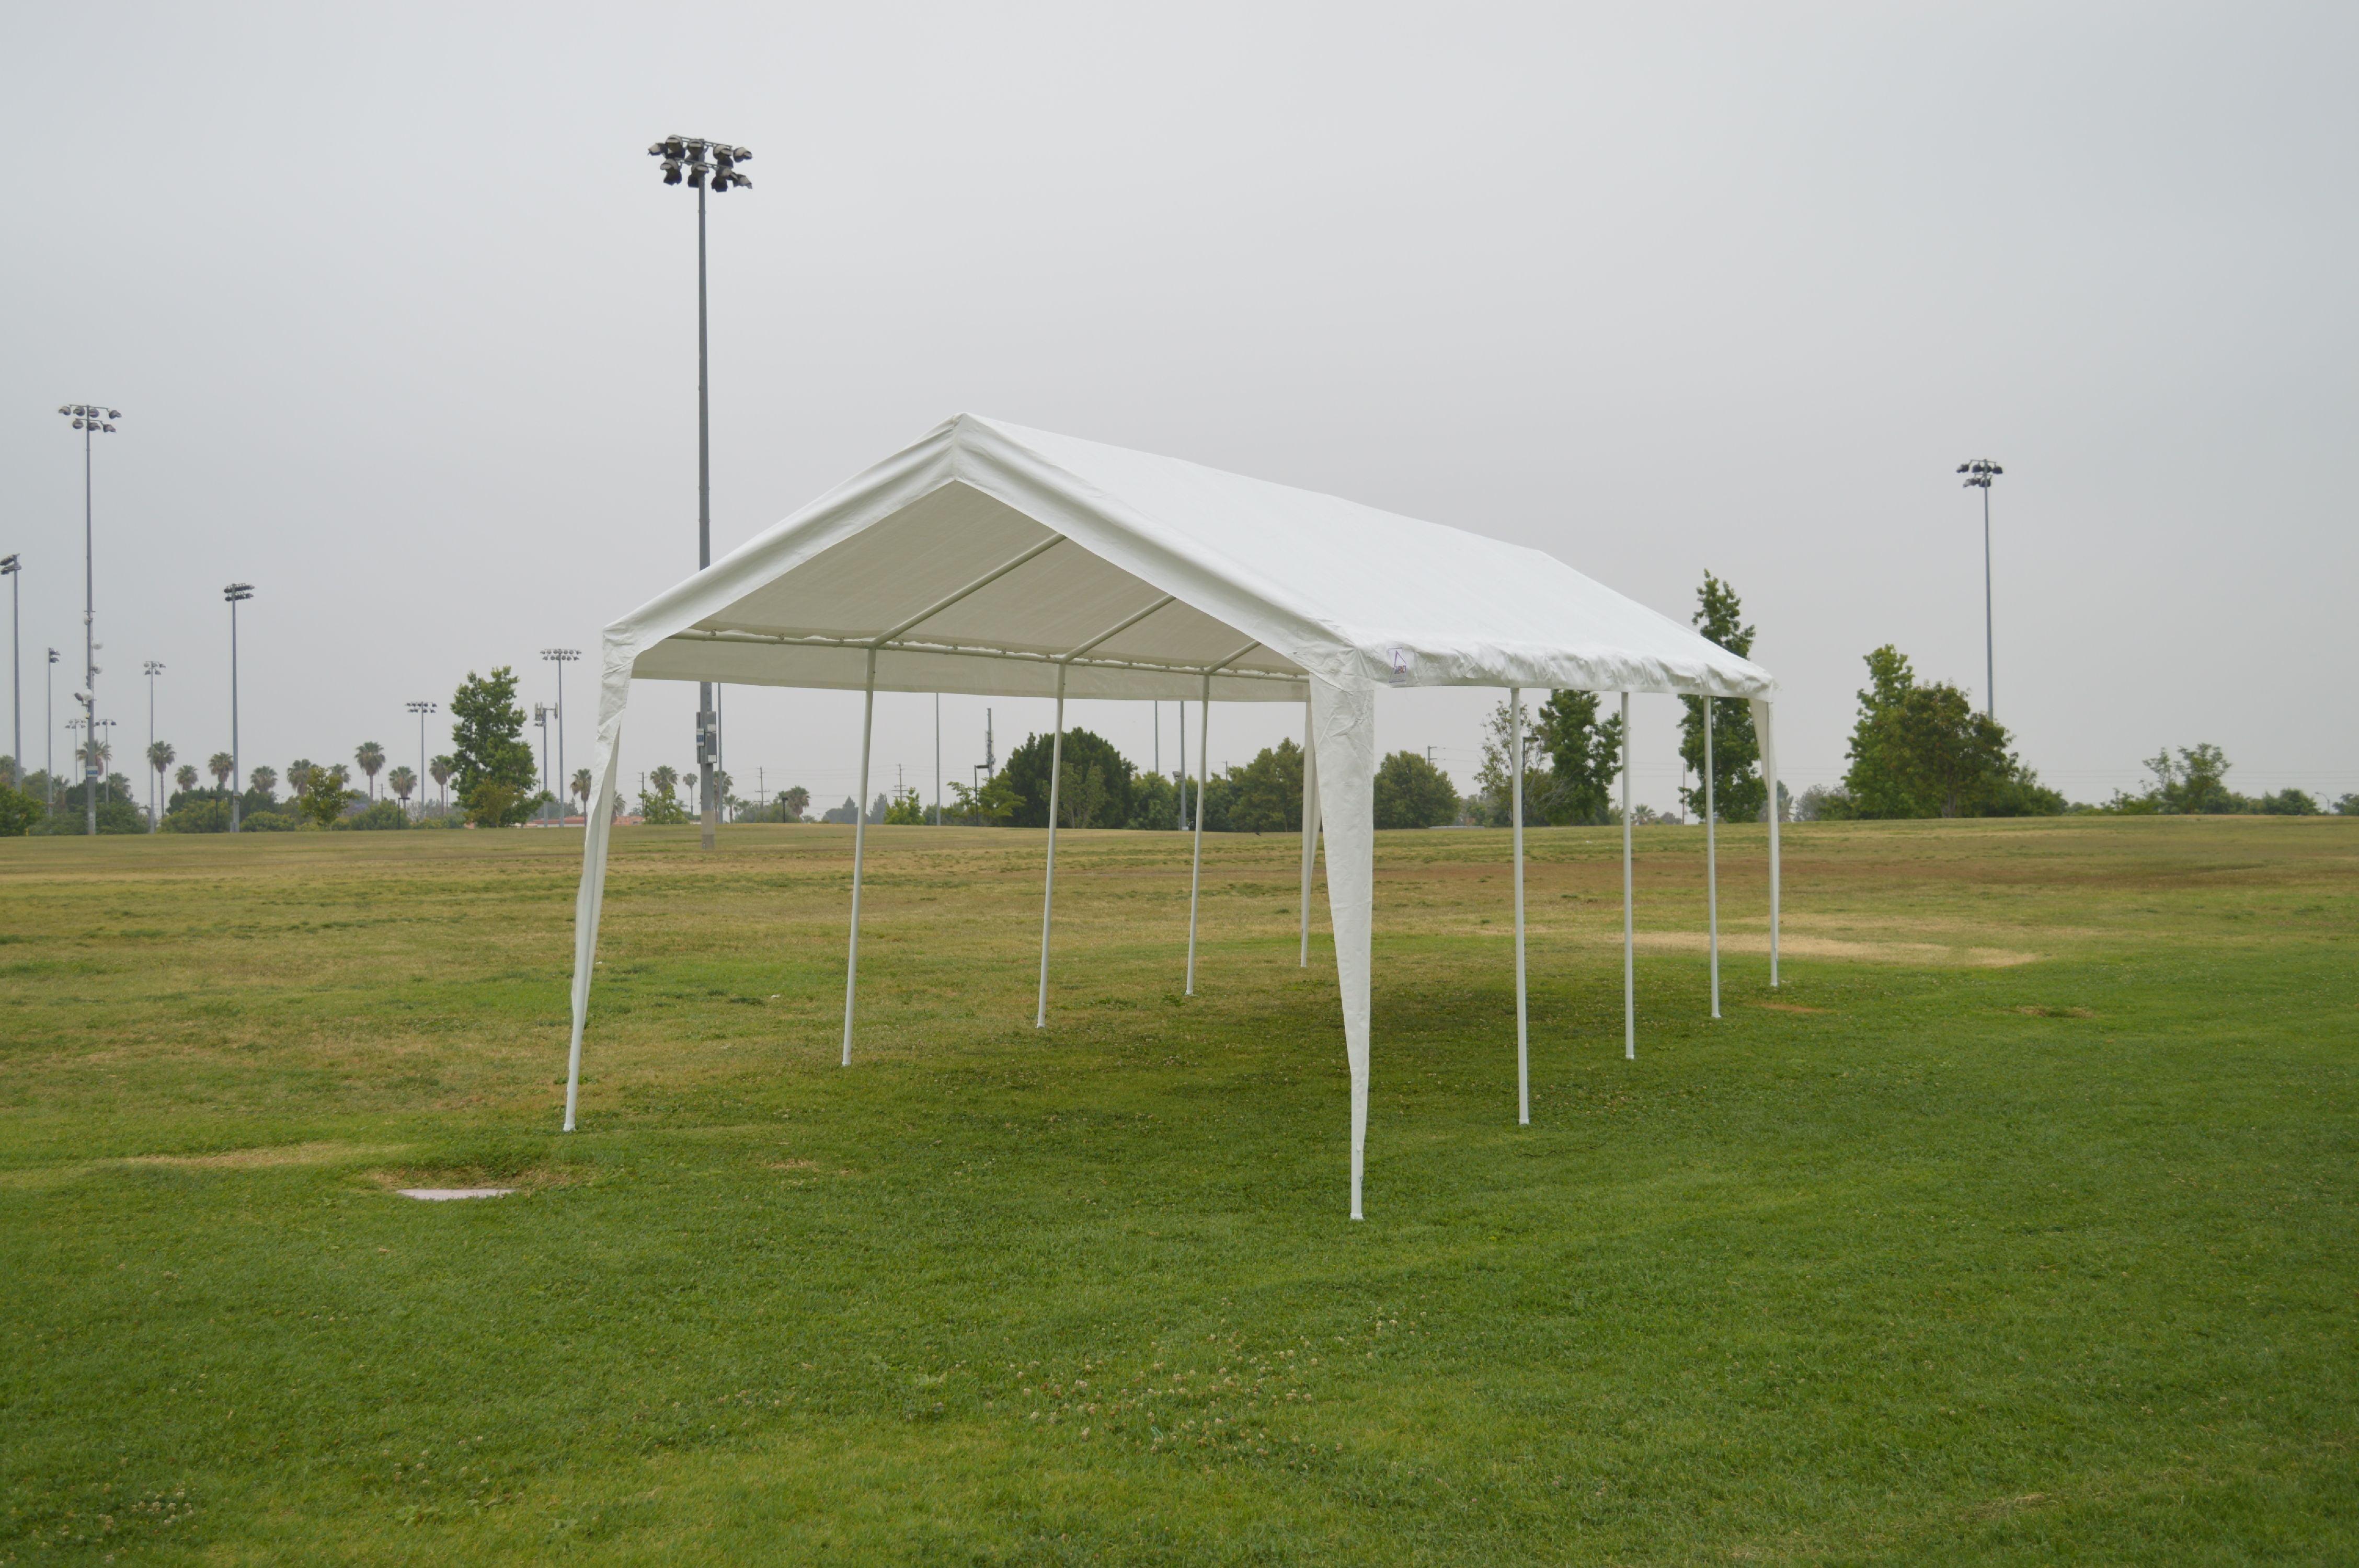 10' x 27' Carport Canopy Universal Grade Dual Carport by Impact Images Inc